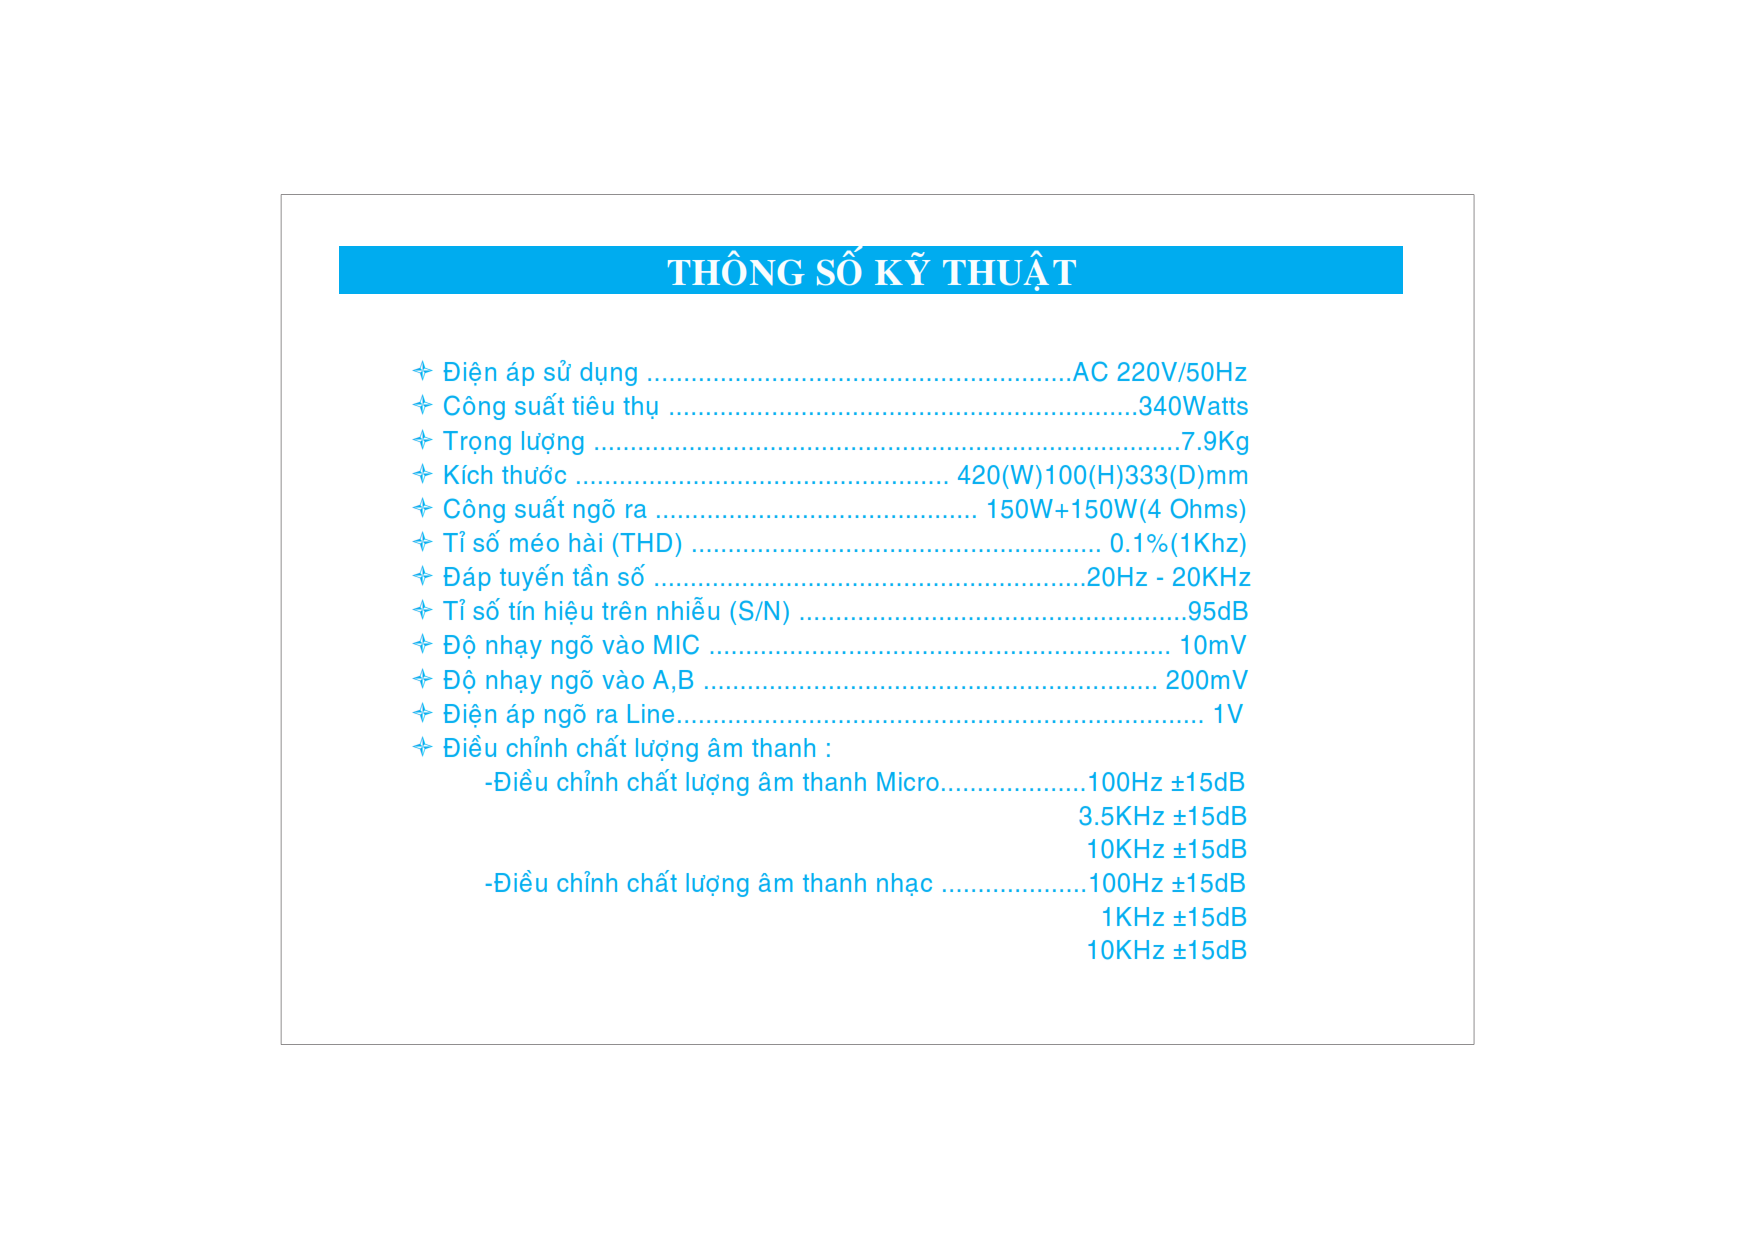 huong-dan-su-dung-amply-karaoke-arirang-HDSD-PA-306-DIGITAL_011.png